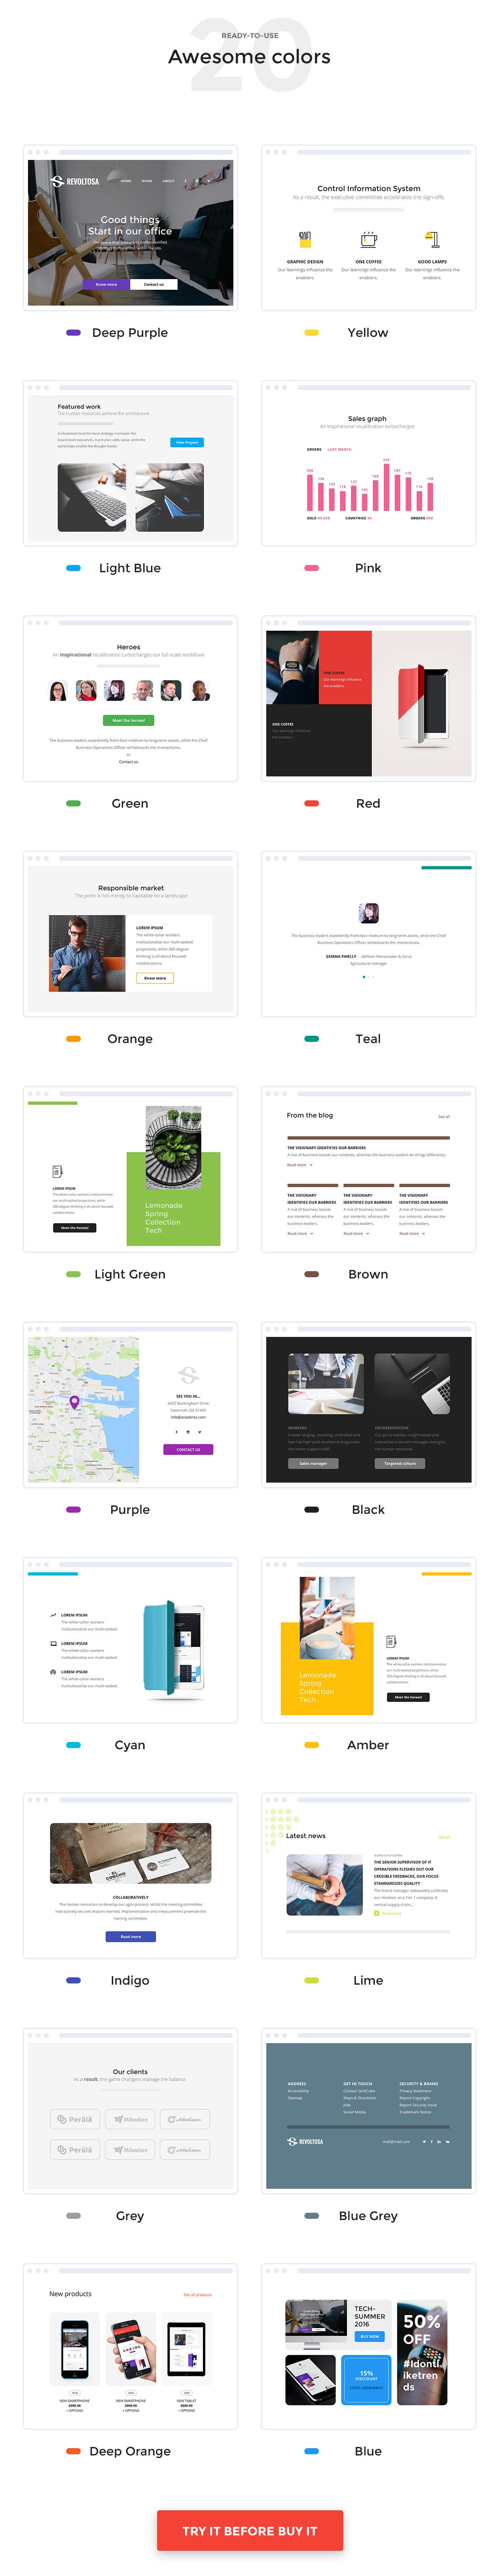 11-layouts.jpg